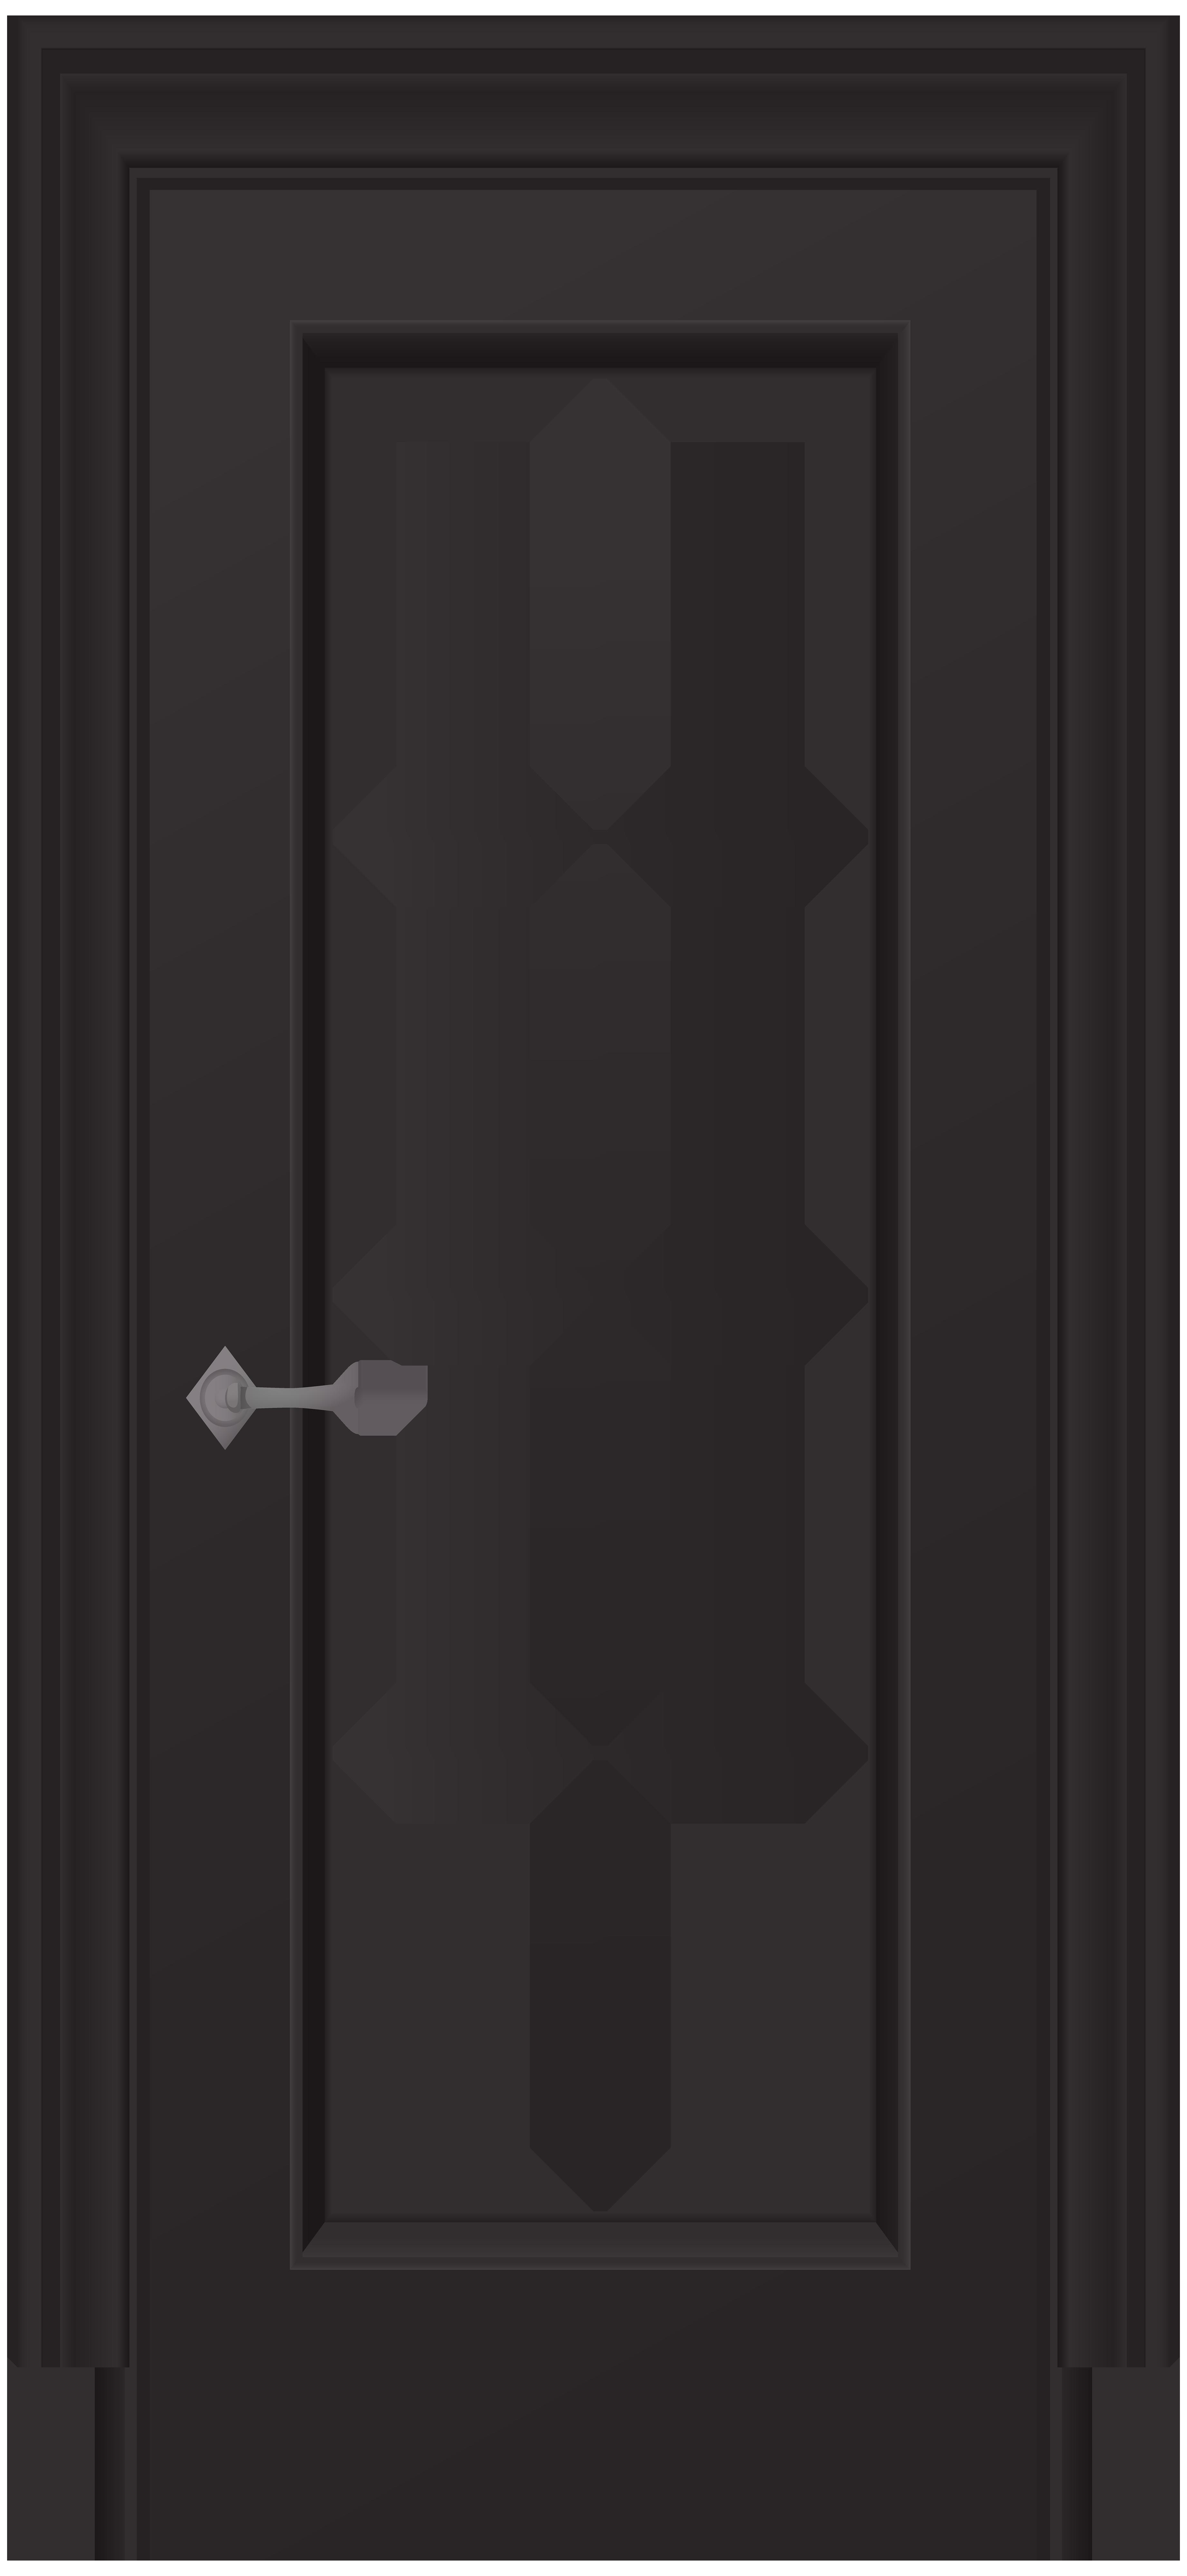 Door clipart black and white. Png clip art best